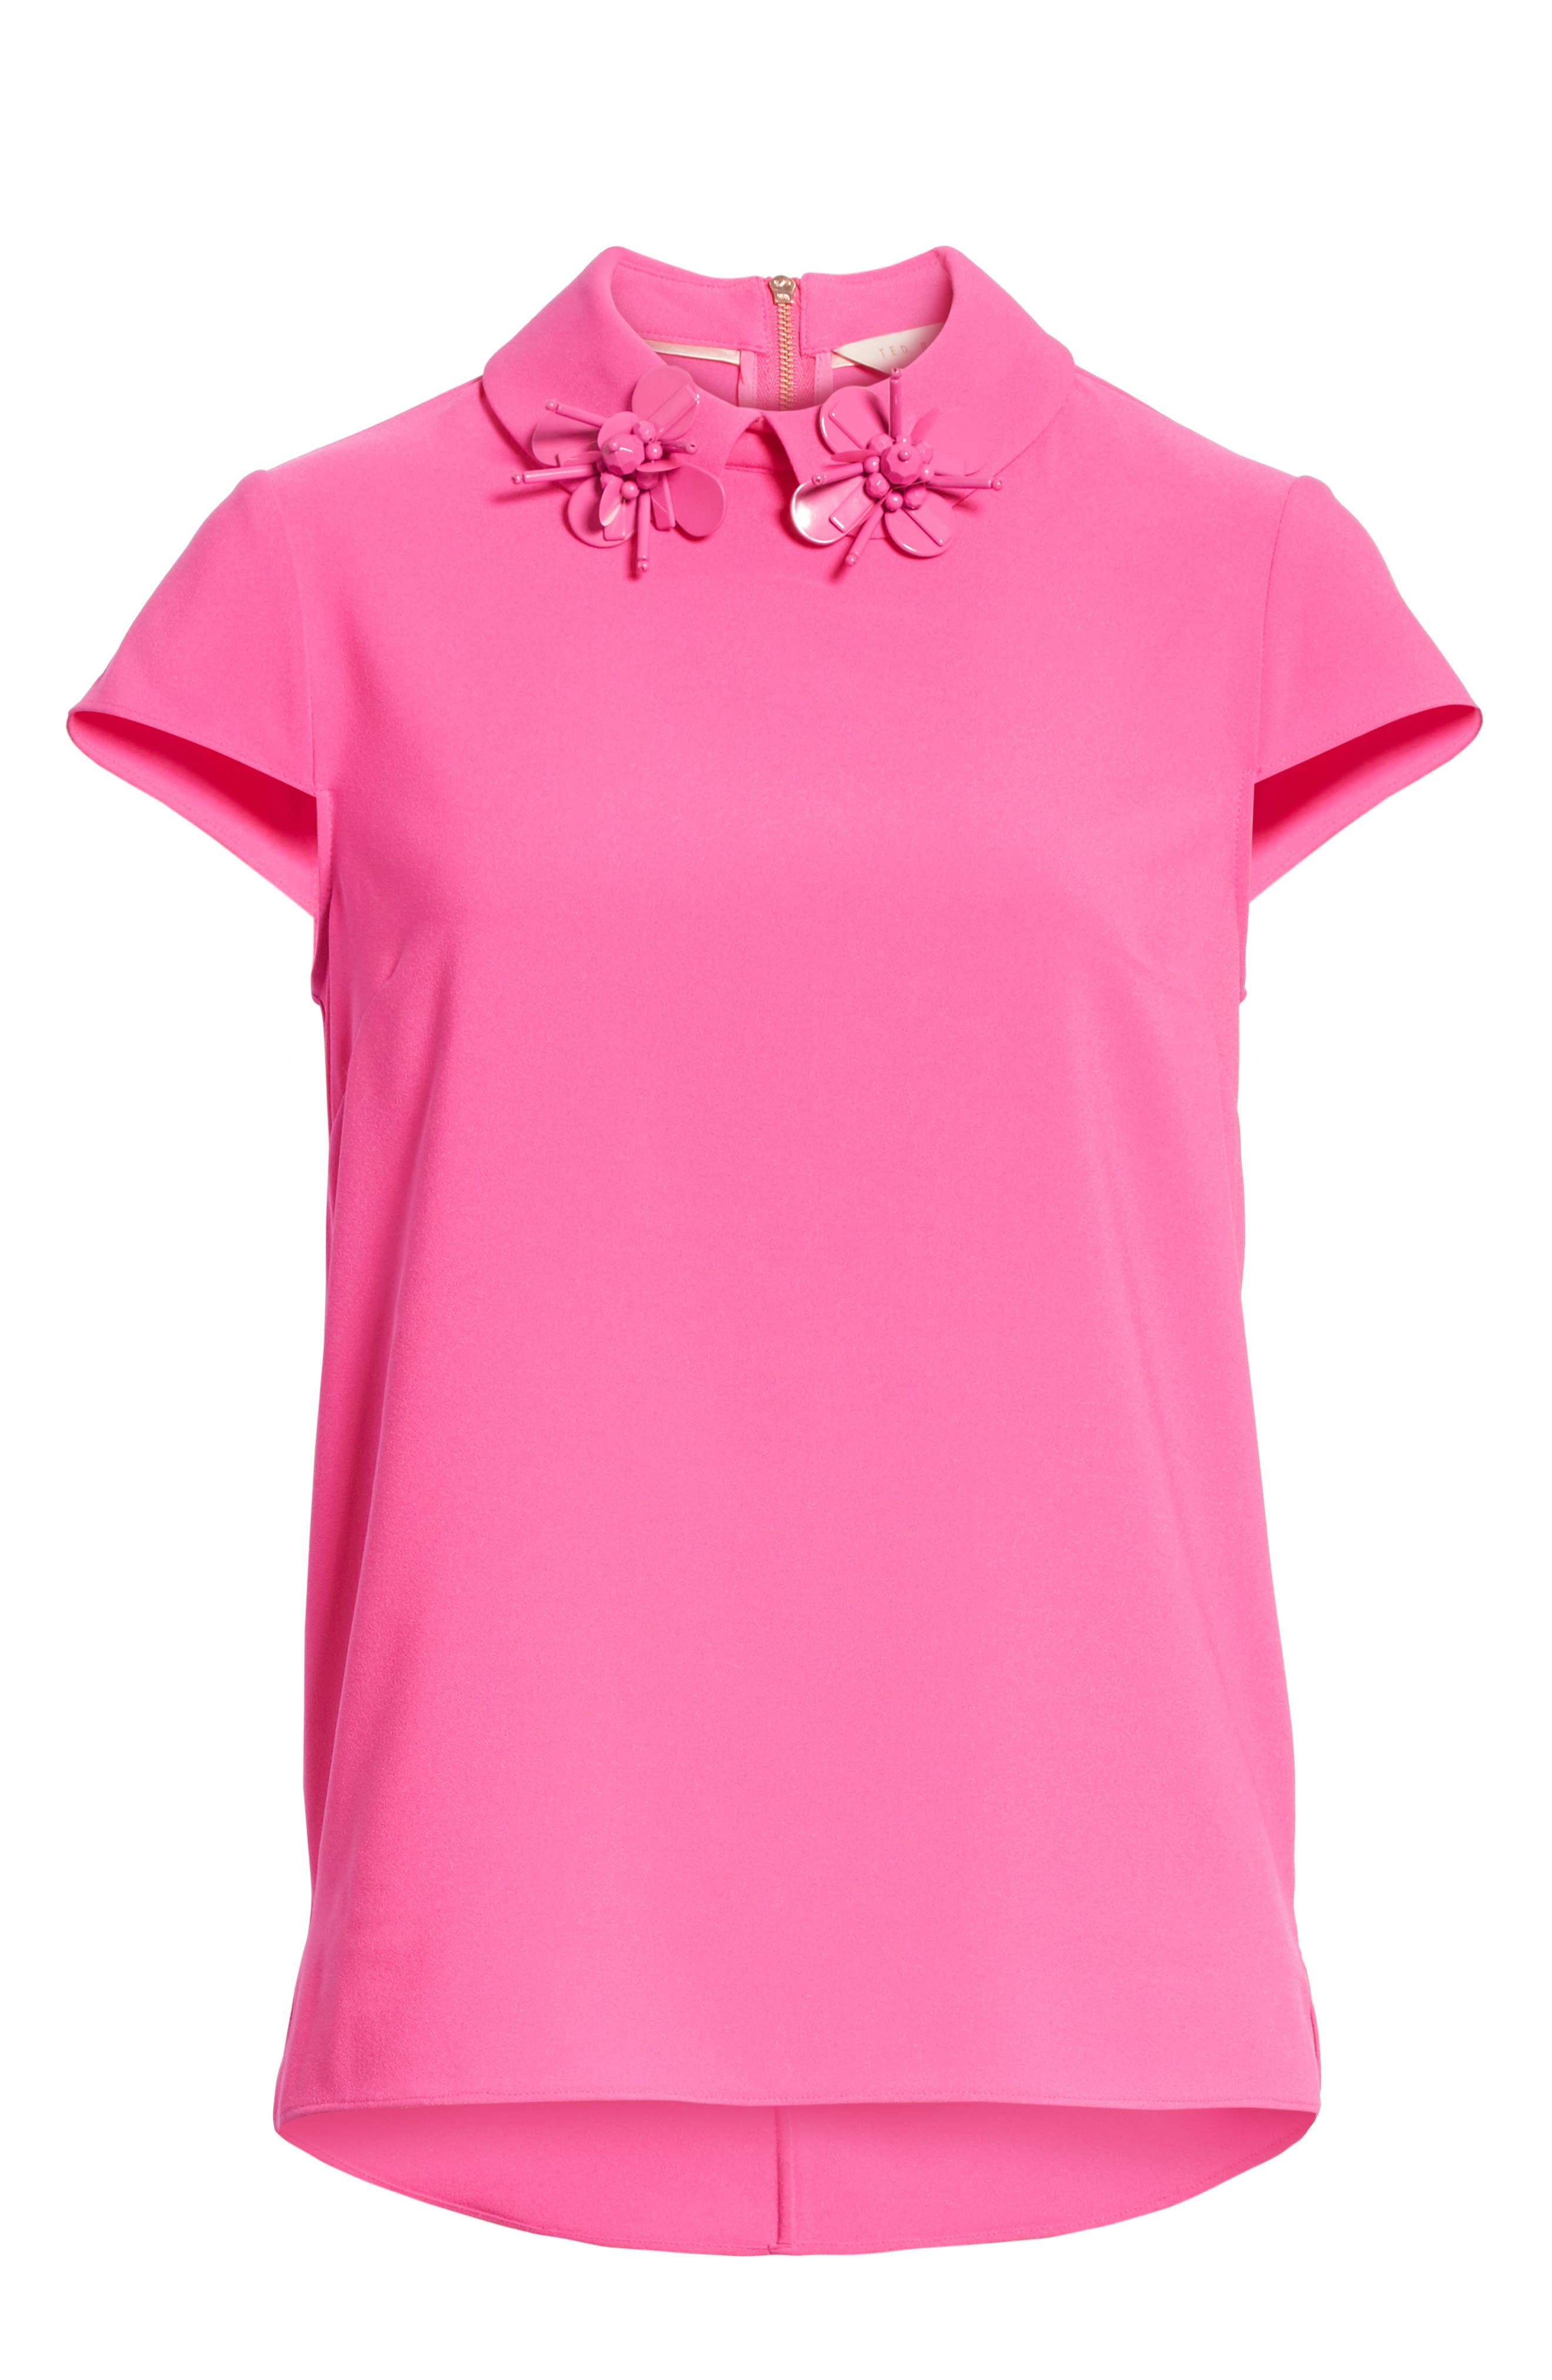 Ammah Embellished Collar Crepe Top,                             Alternate thumbnail 6, color,                             Neon Pink